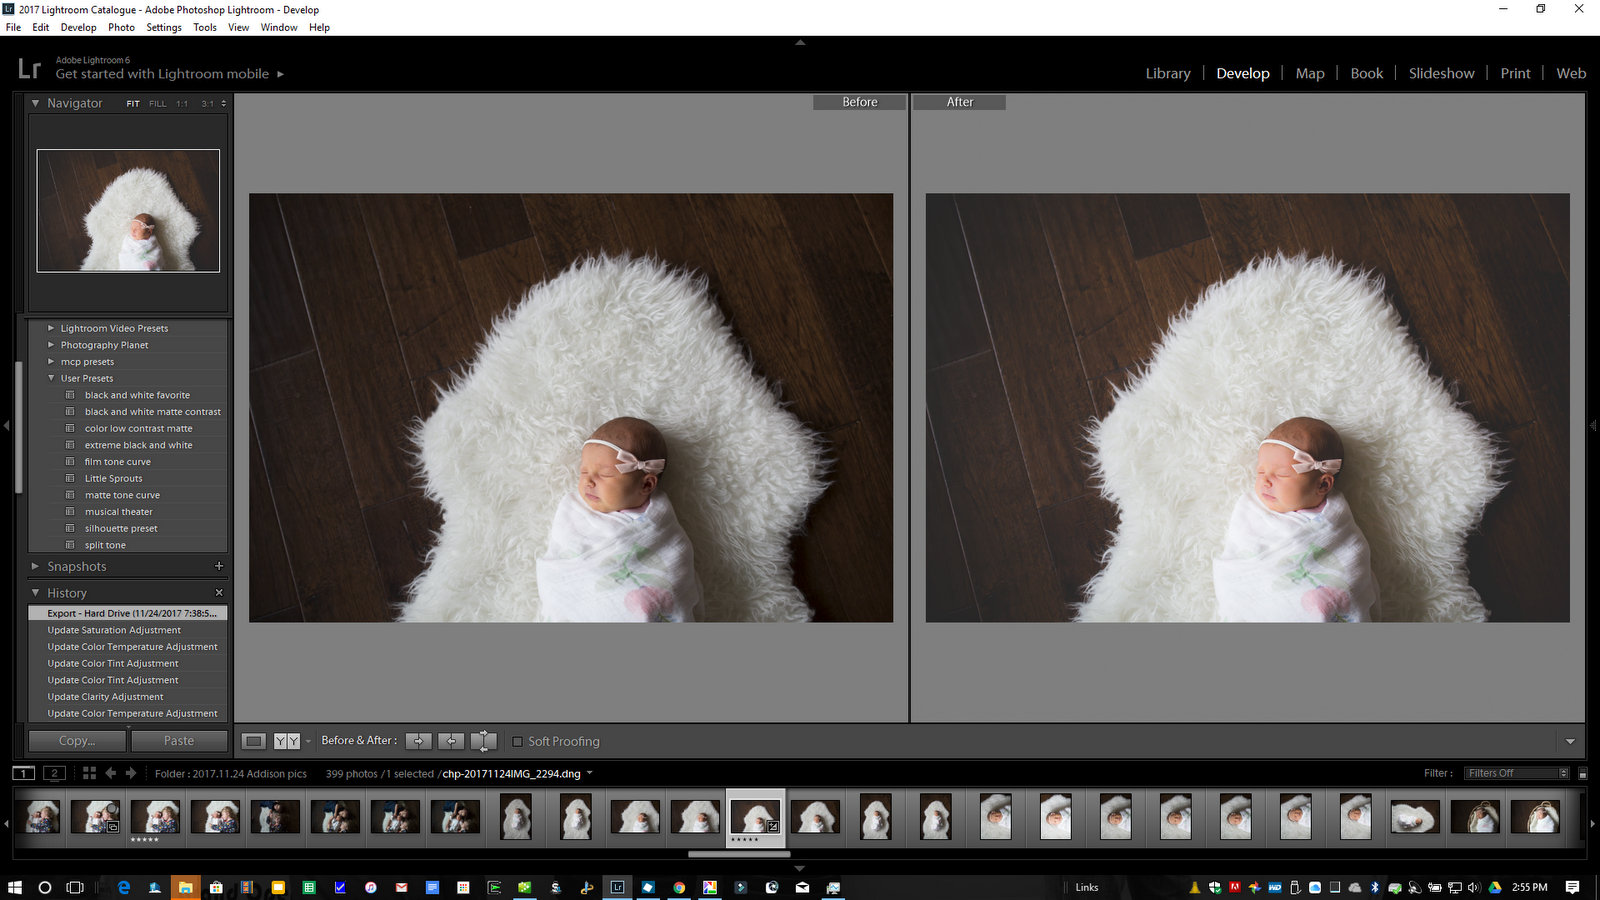 09-Fullscreen capture 11282017 25532 PM.jpg